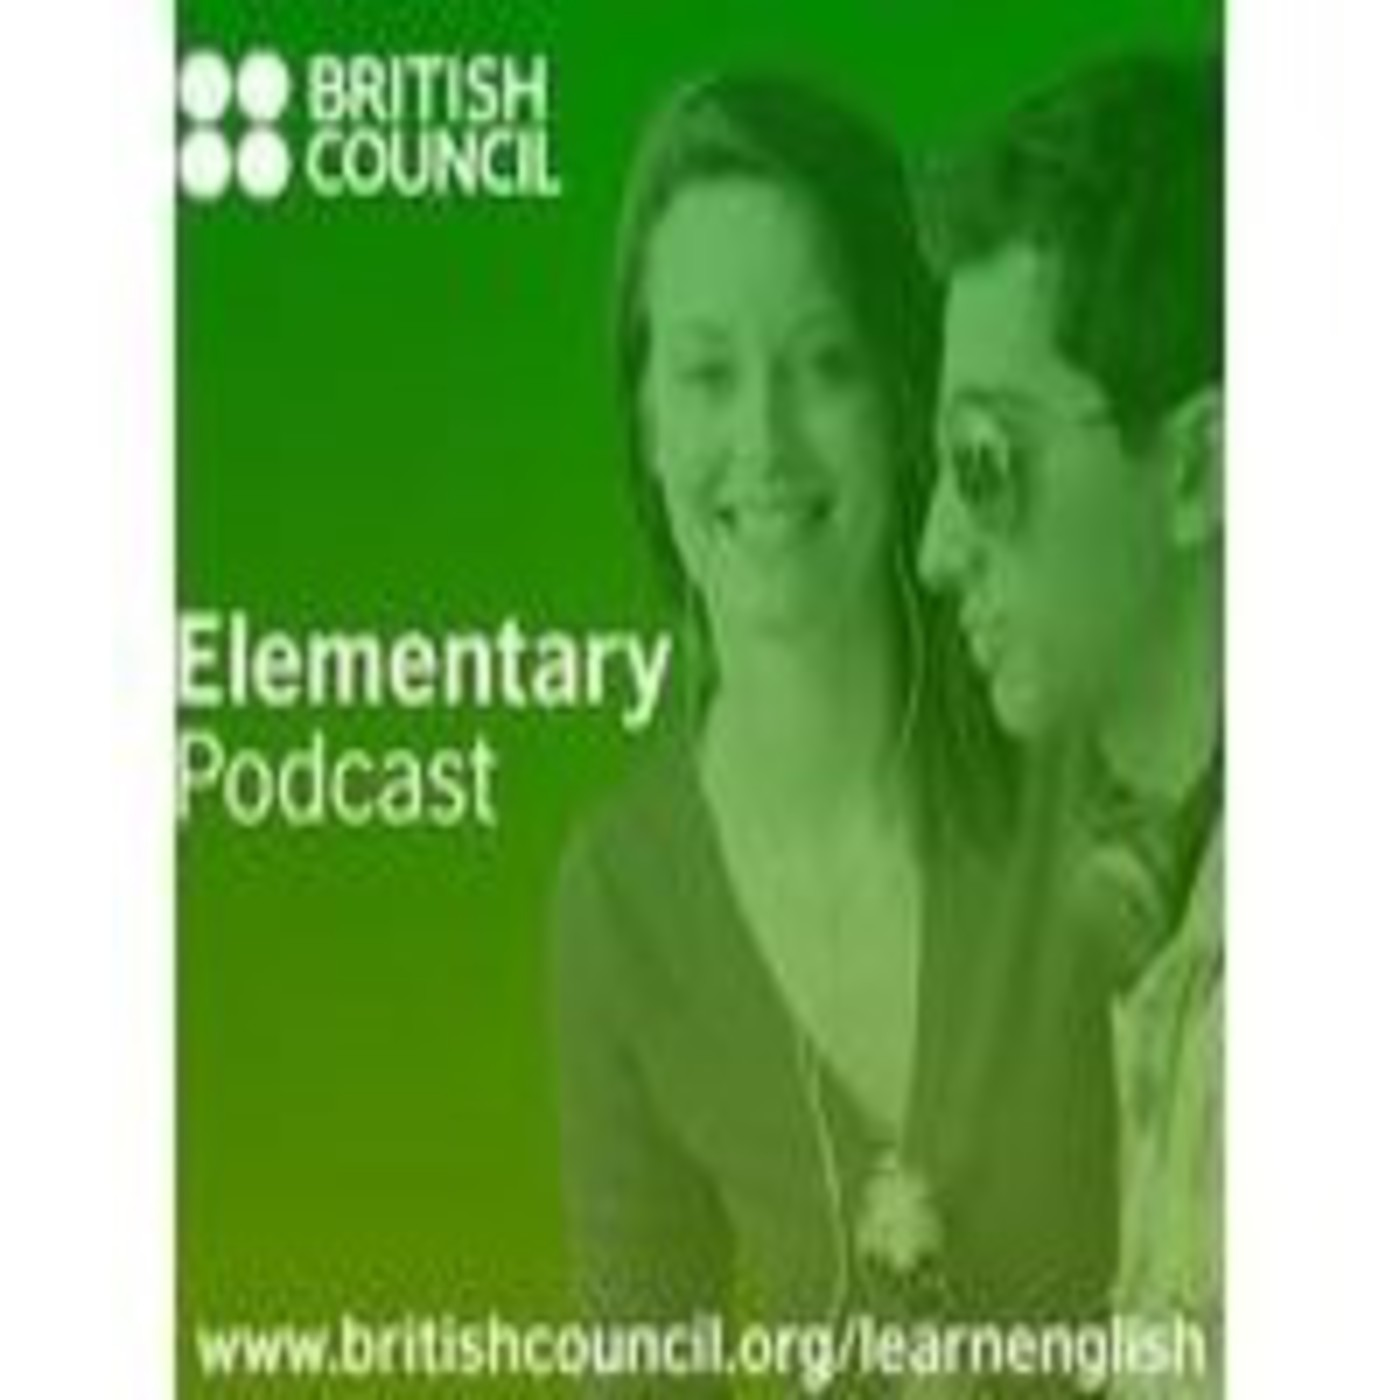 Series 3 - Podcast 19